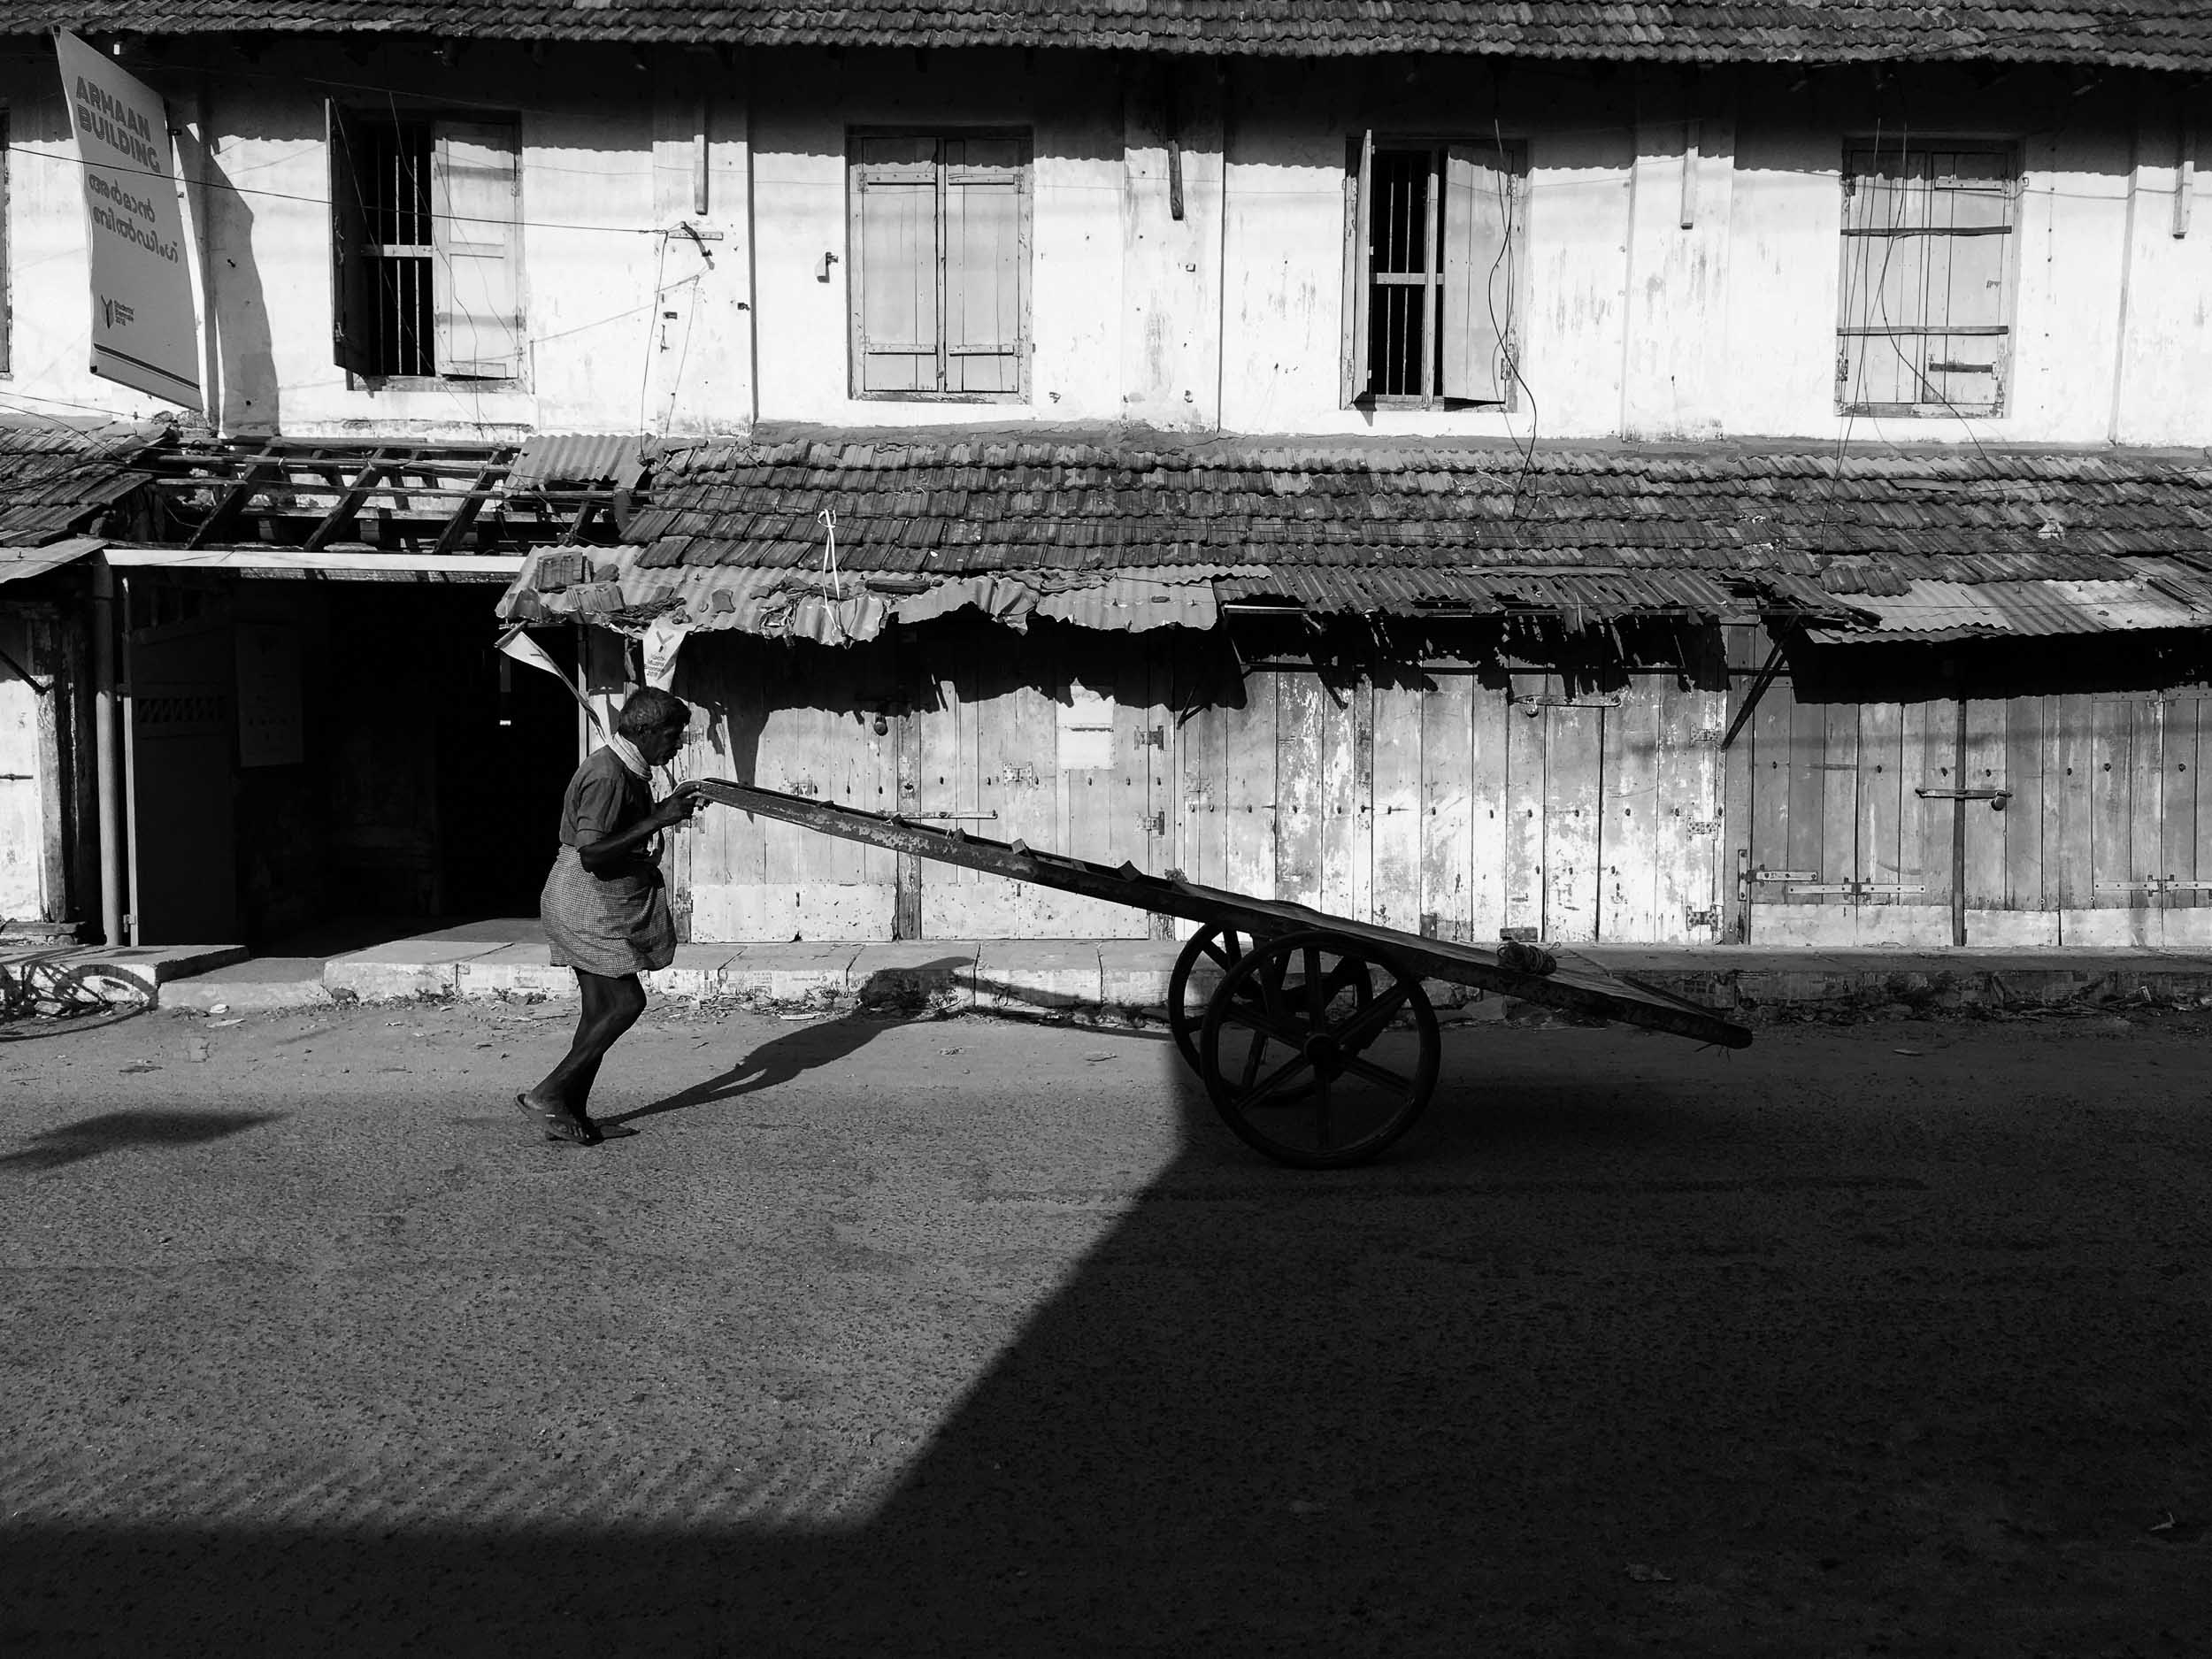 Sindhur_Photography_Kochi Muziris Biennale -2019-50.JPG